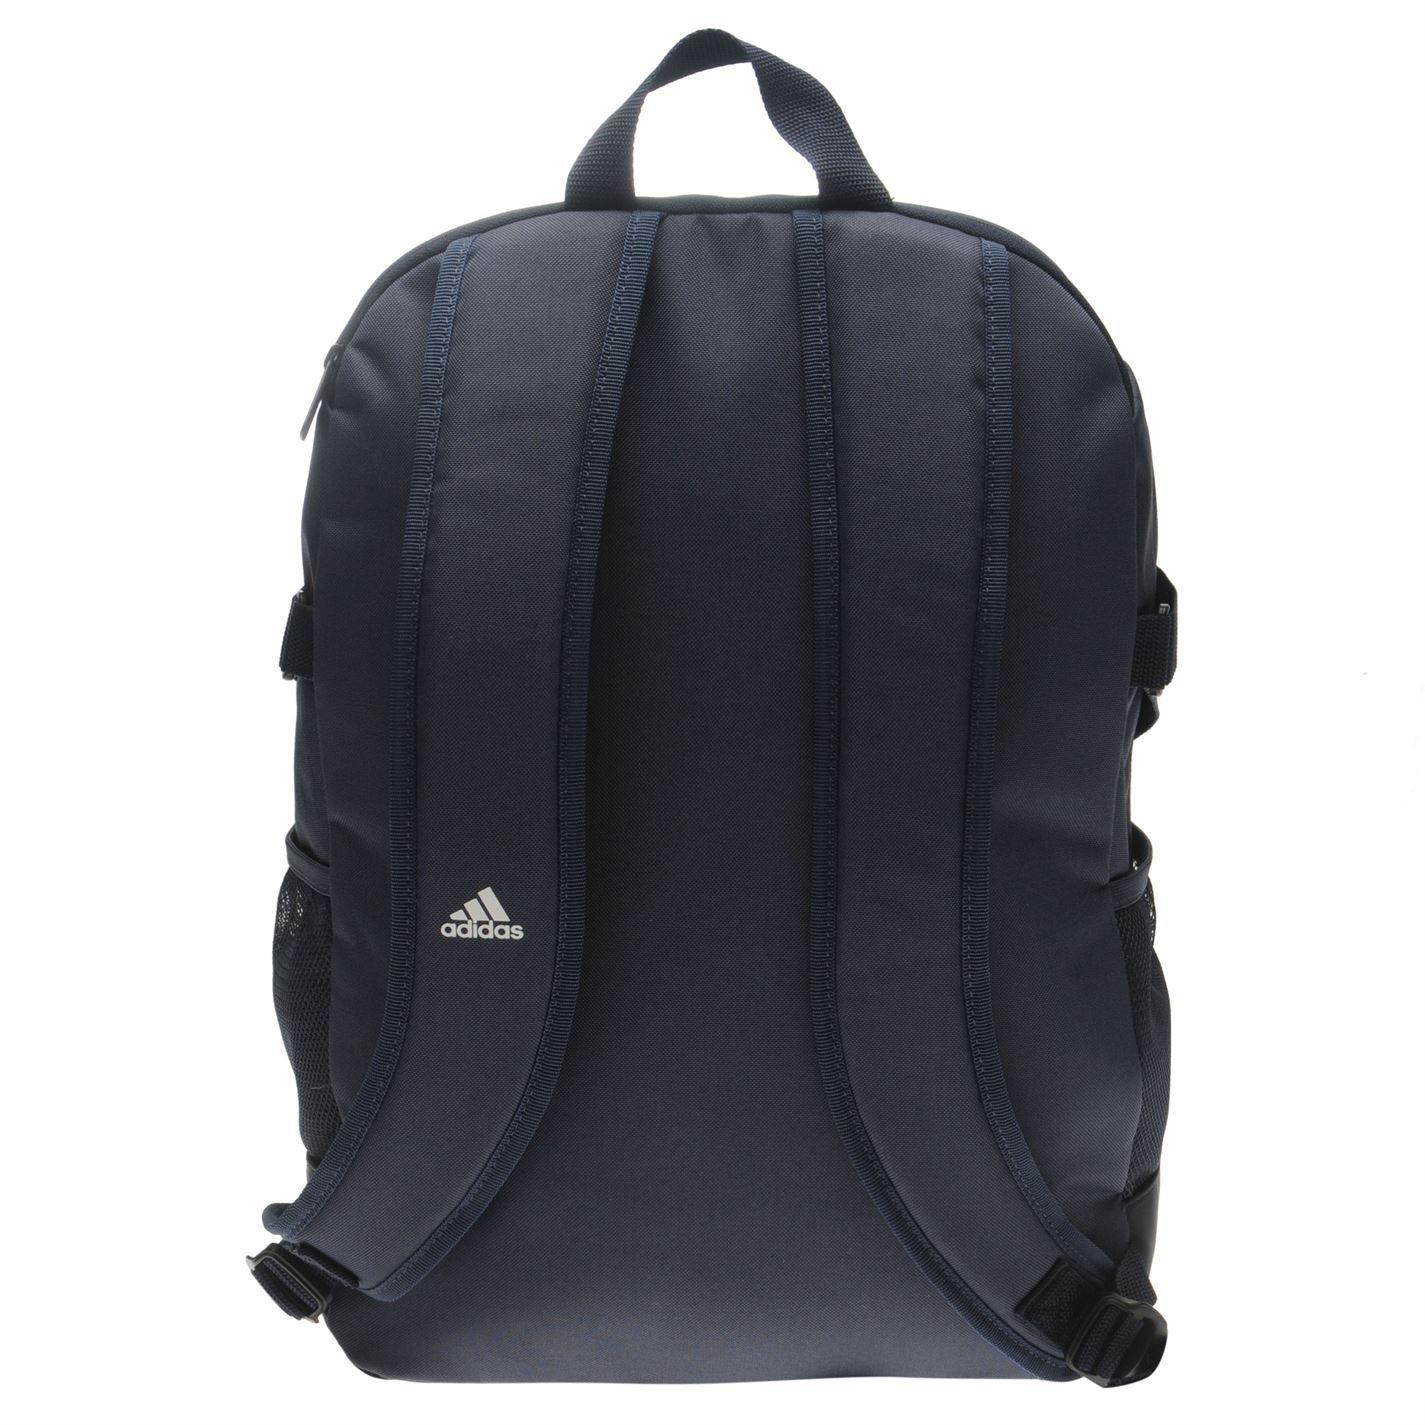 28847cea12 ... Adidas Power 4 mochila azul marino blanco deportes bolsa bolsa mochila